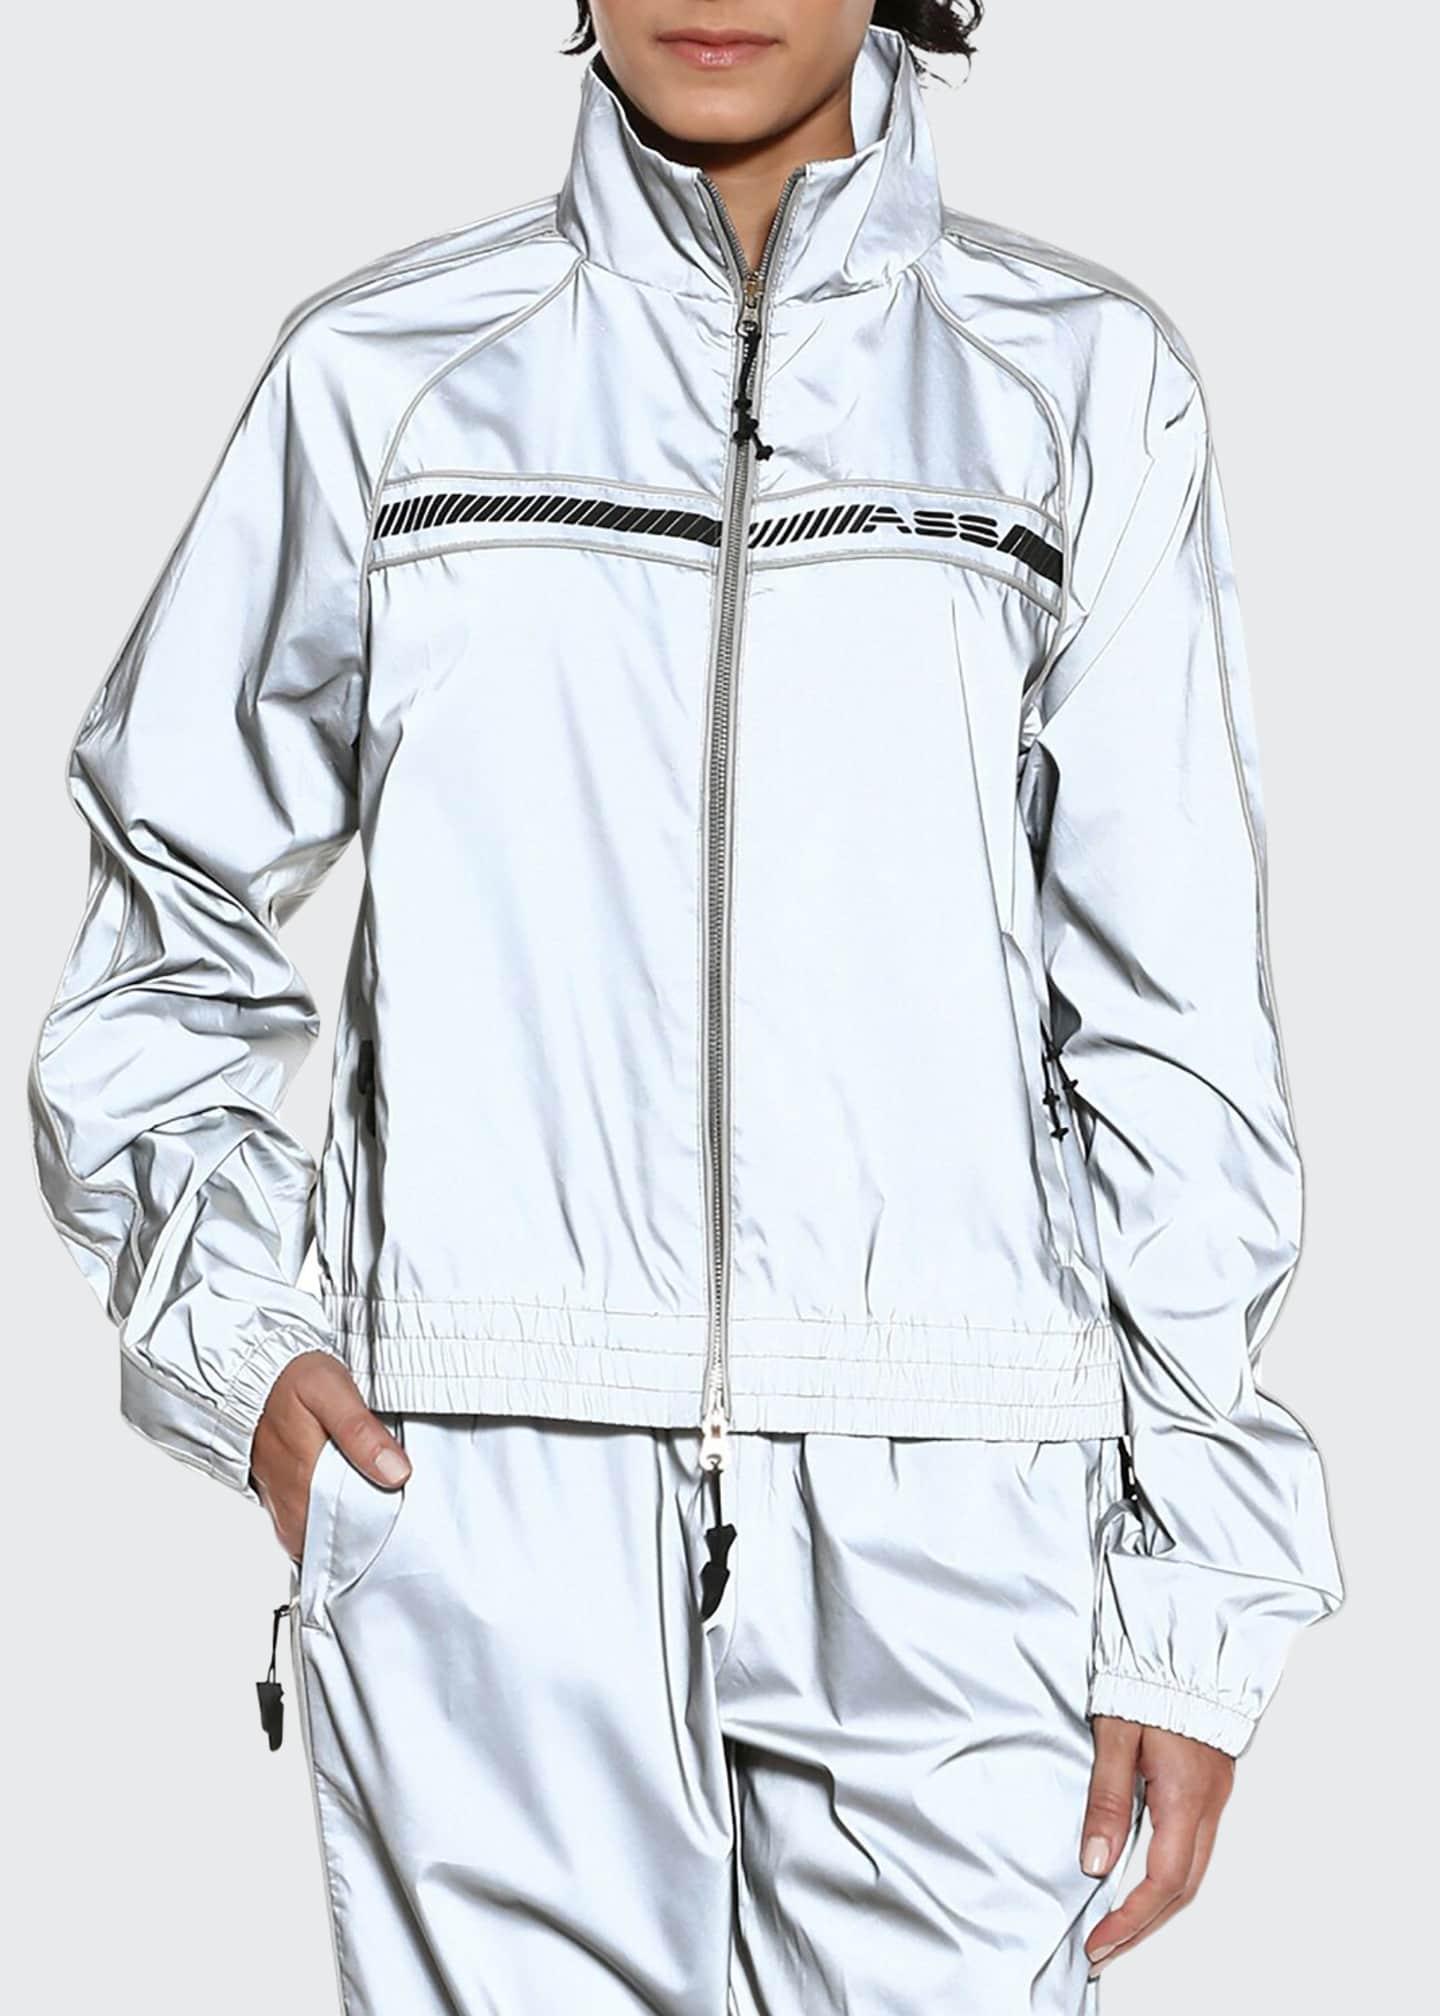 Adam Selman Sport Unisex Track Jacket